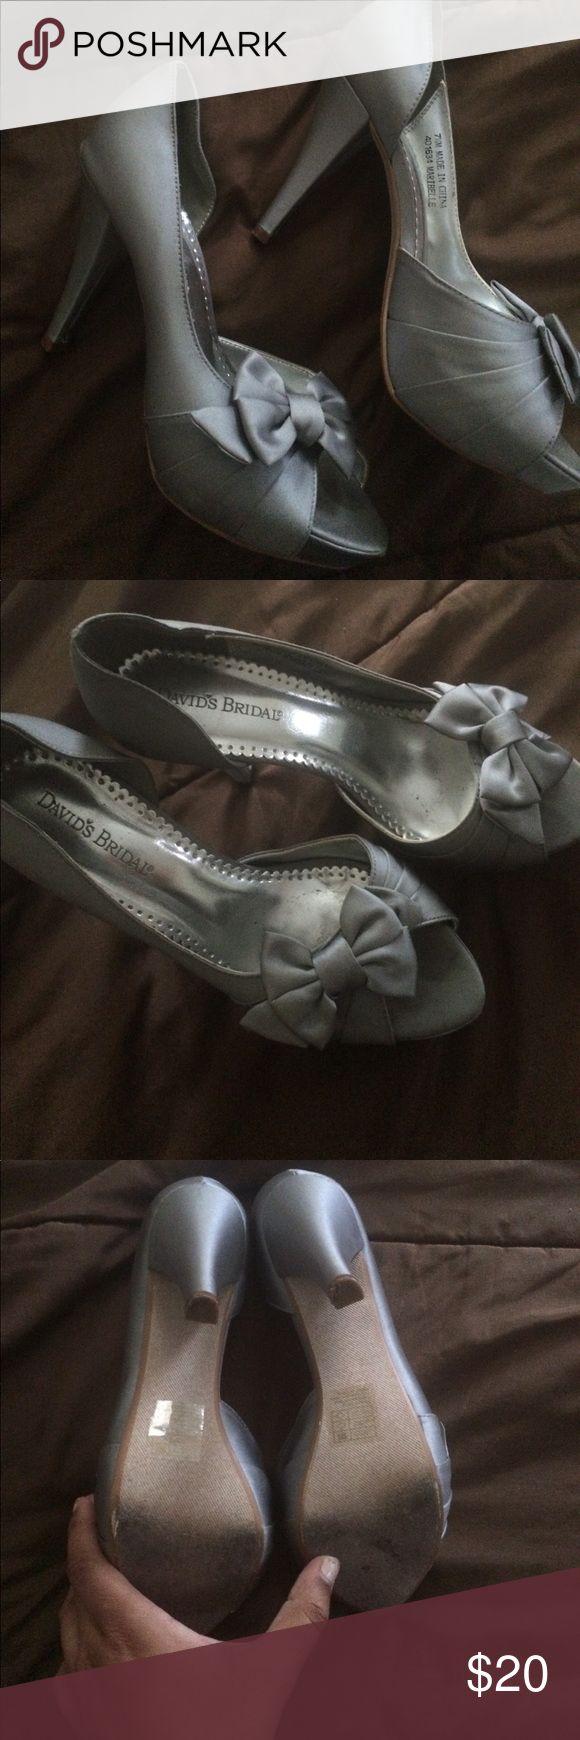 David's Bridal Bridesmaid shoes David's Bridal Bridesmad shoes. Worn once. In excellent condition. David's Bridal Shoes Heels